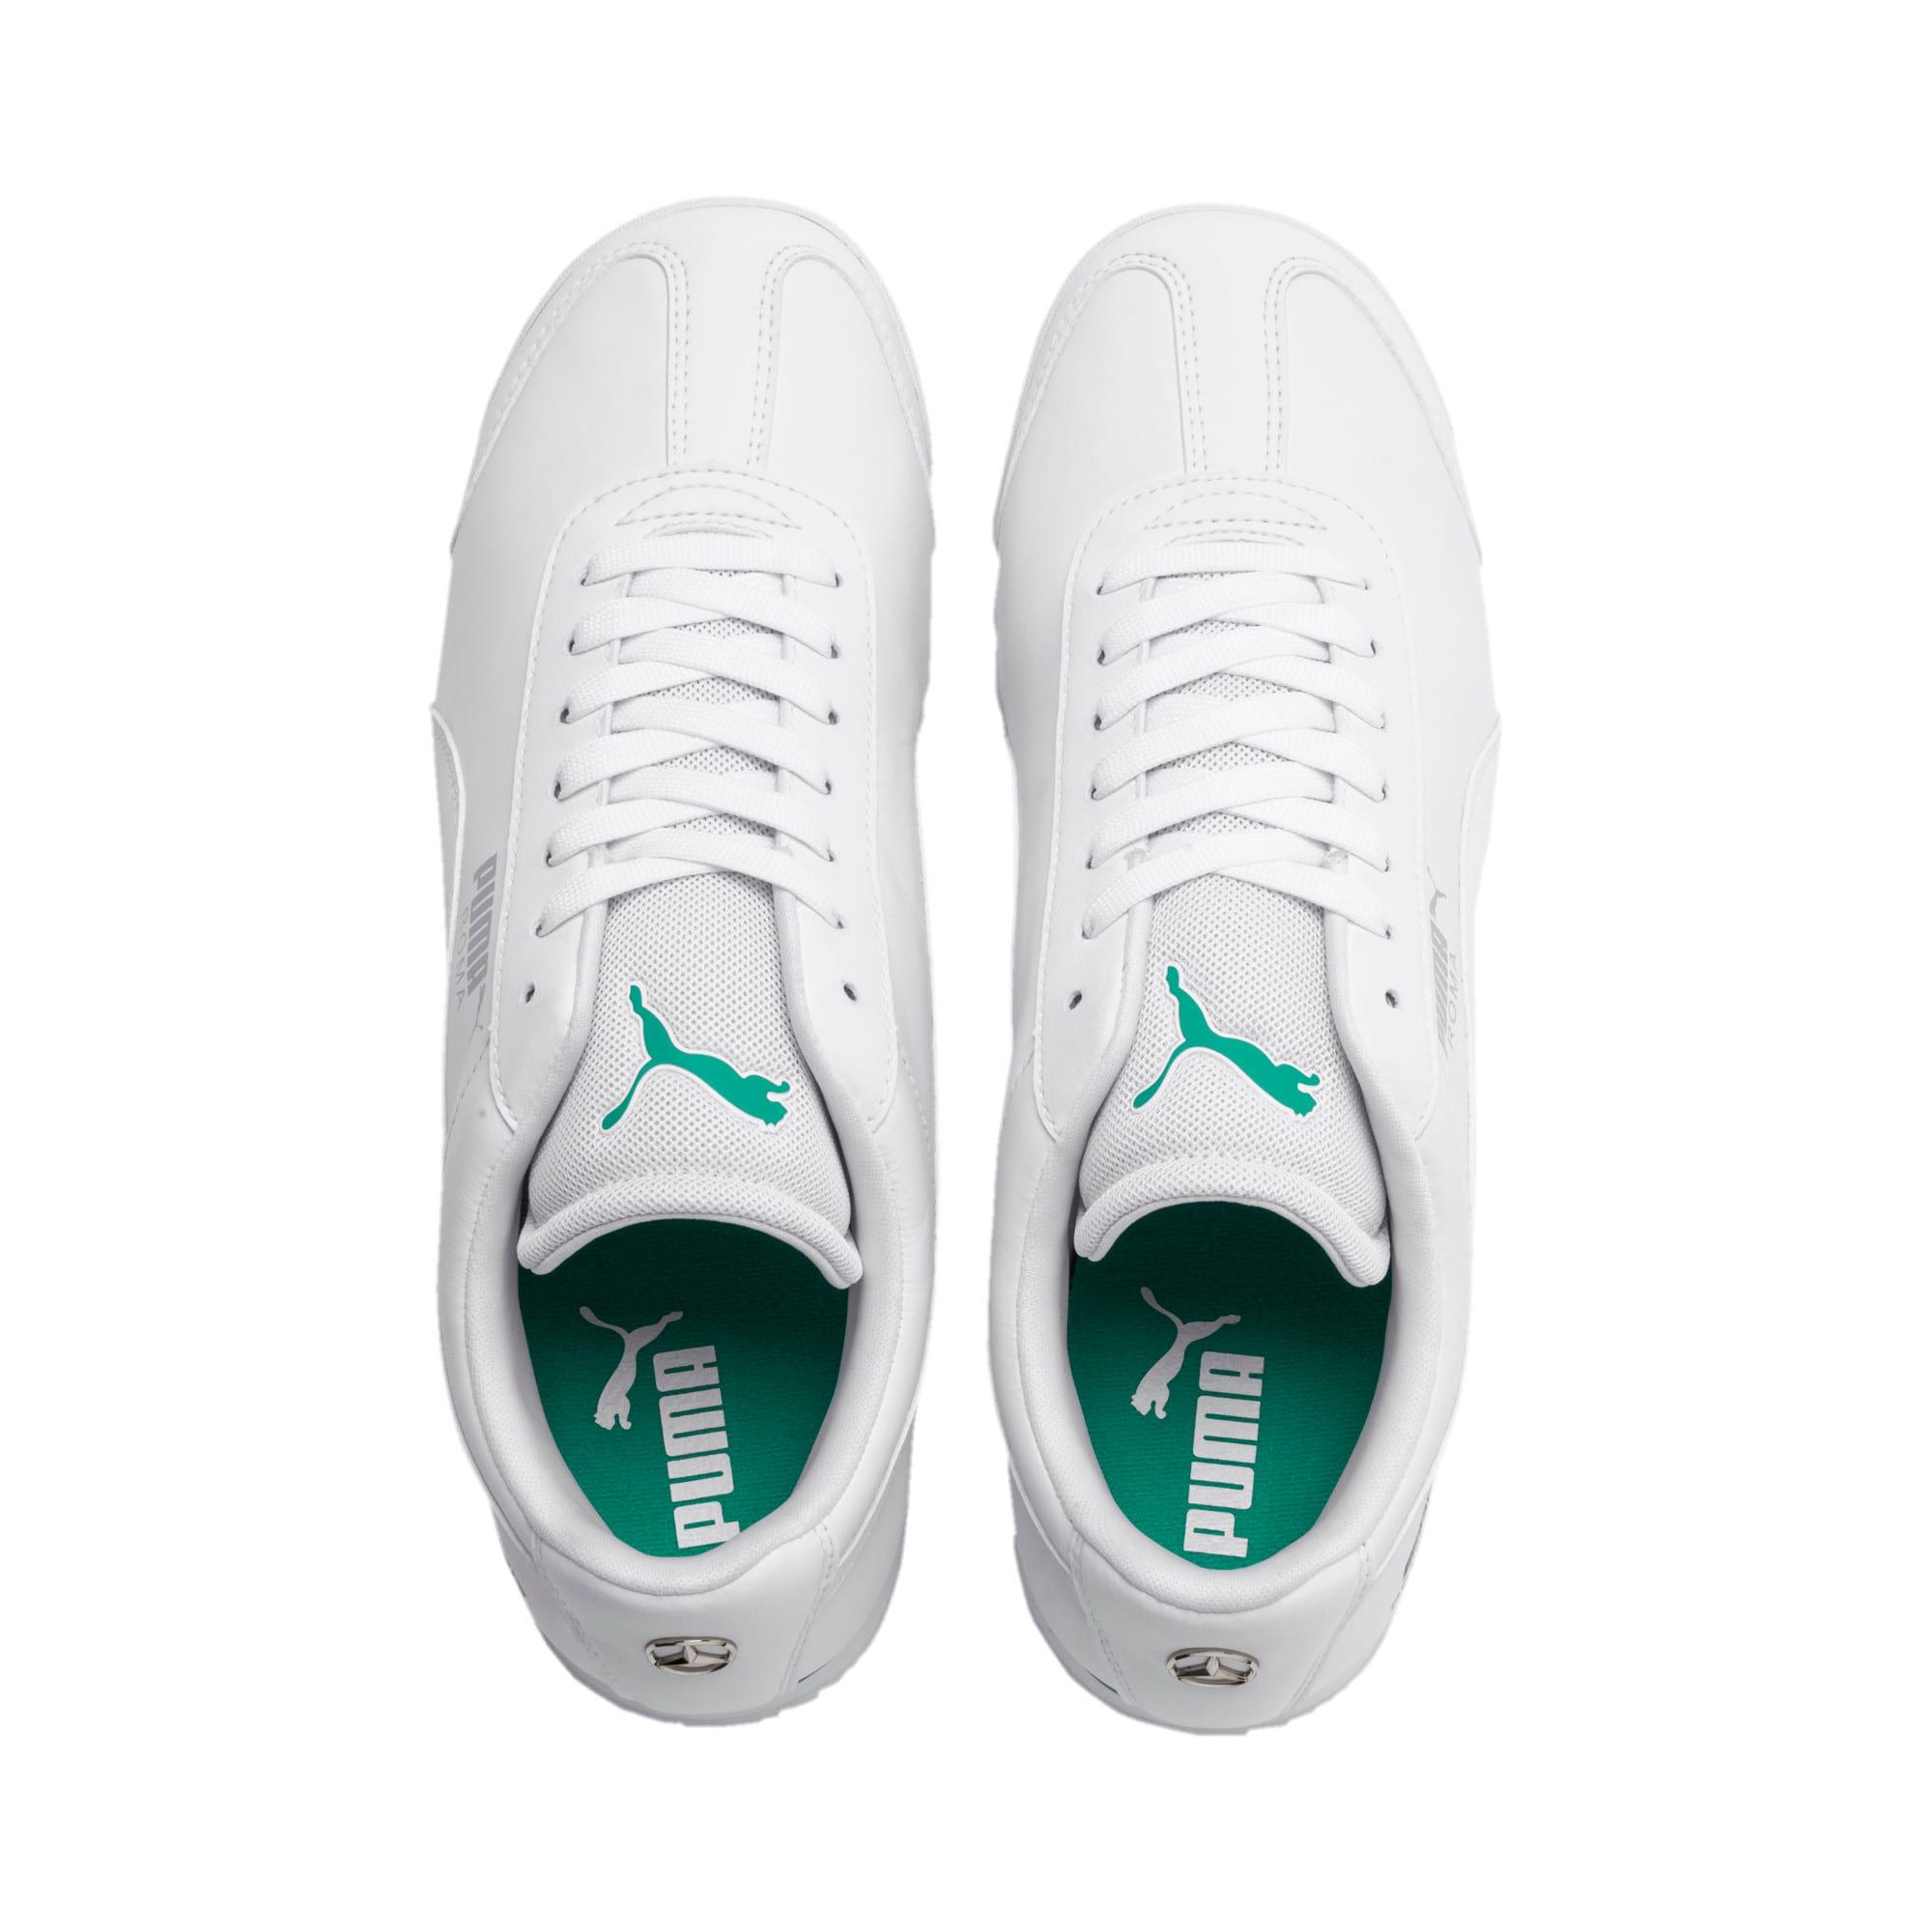 Thumbnail 7 of Mercedes AMG Petronas Roma Men's Sneakers, Puma White-Puma White, medium